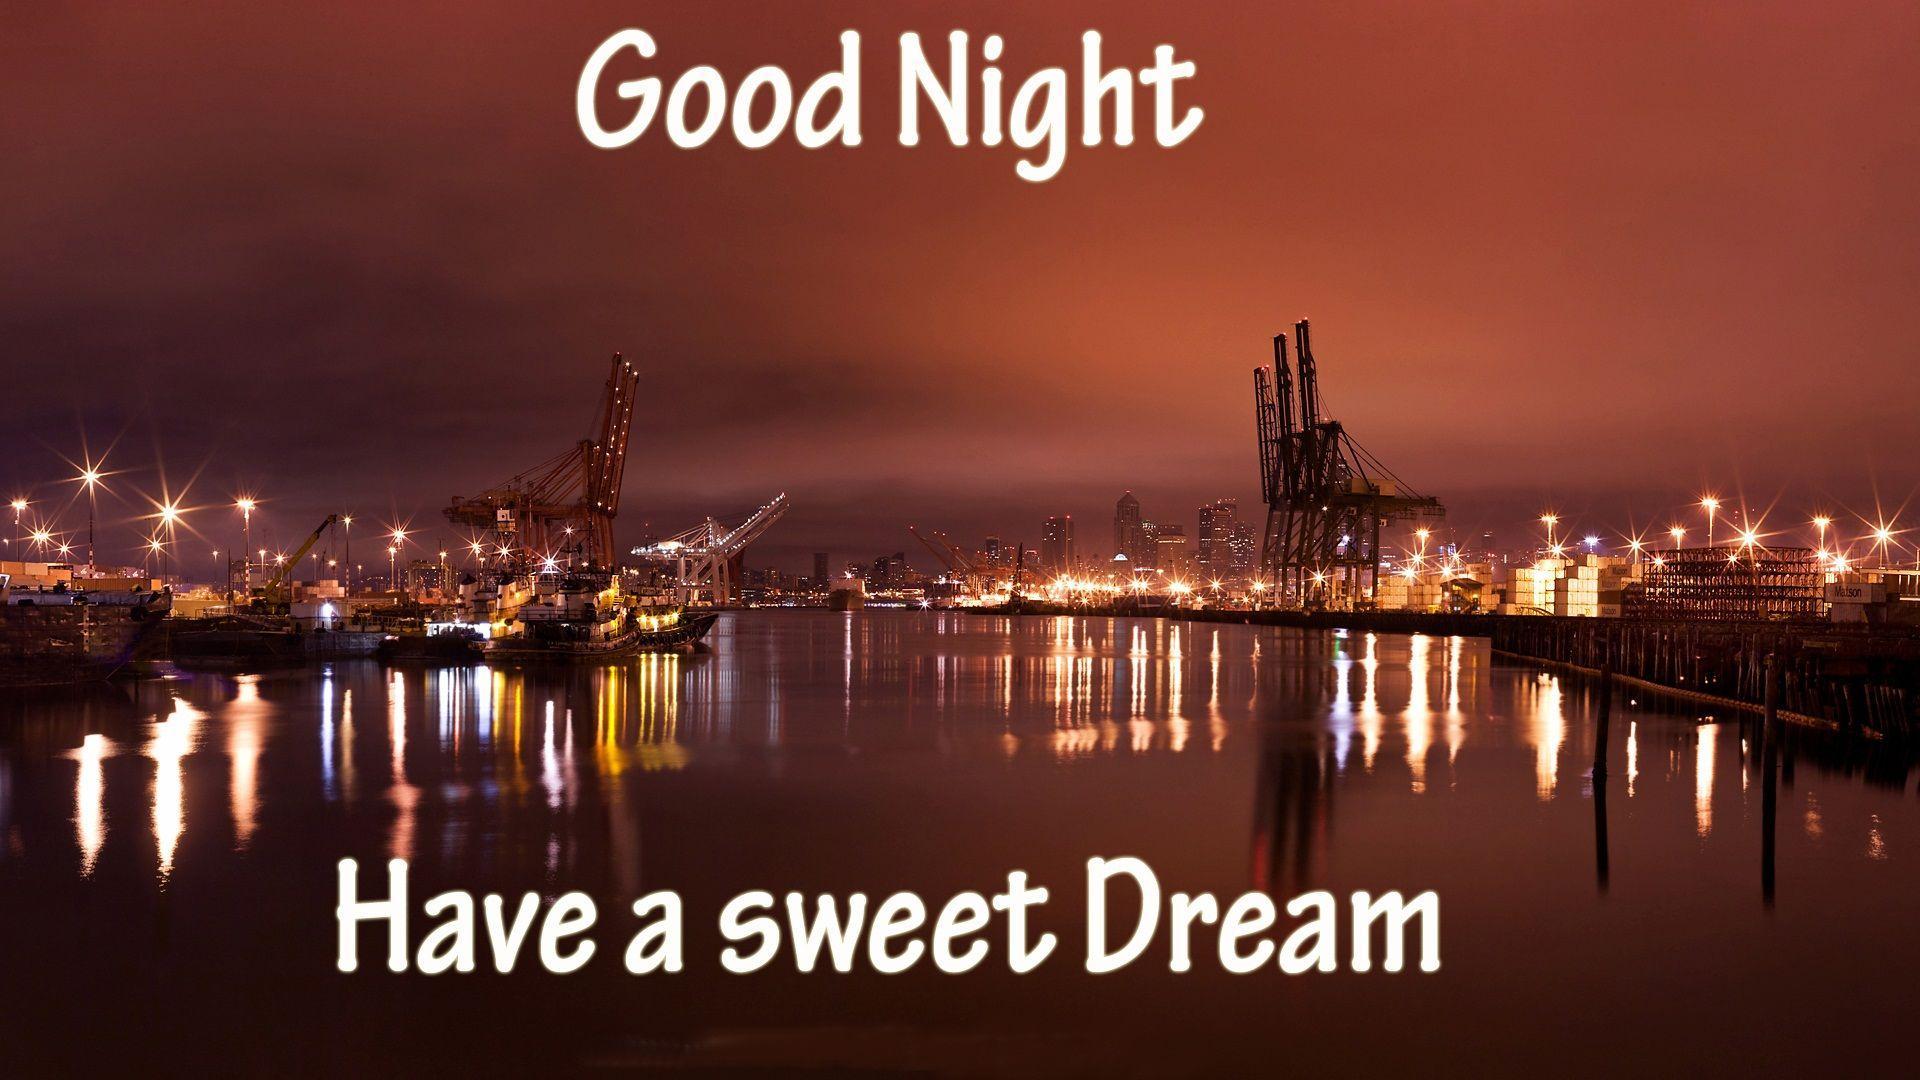 Latest Good Night HD Wallpaper Free Download 2014